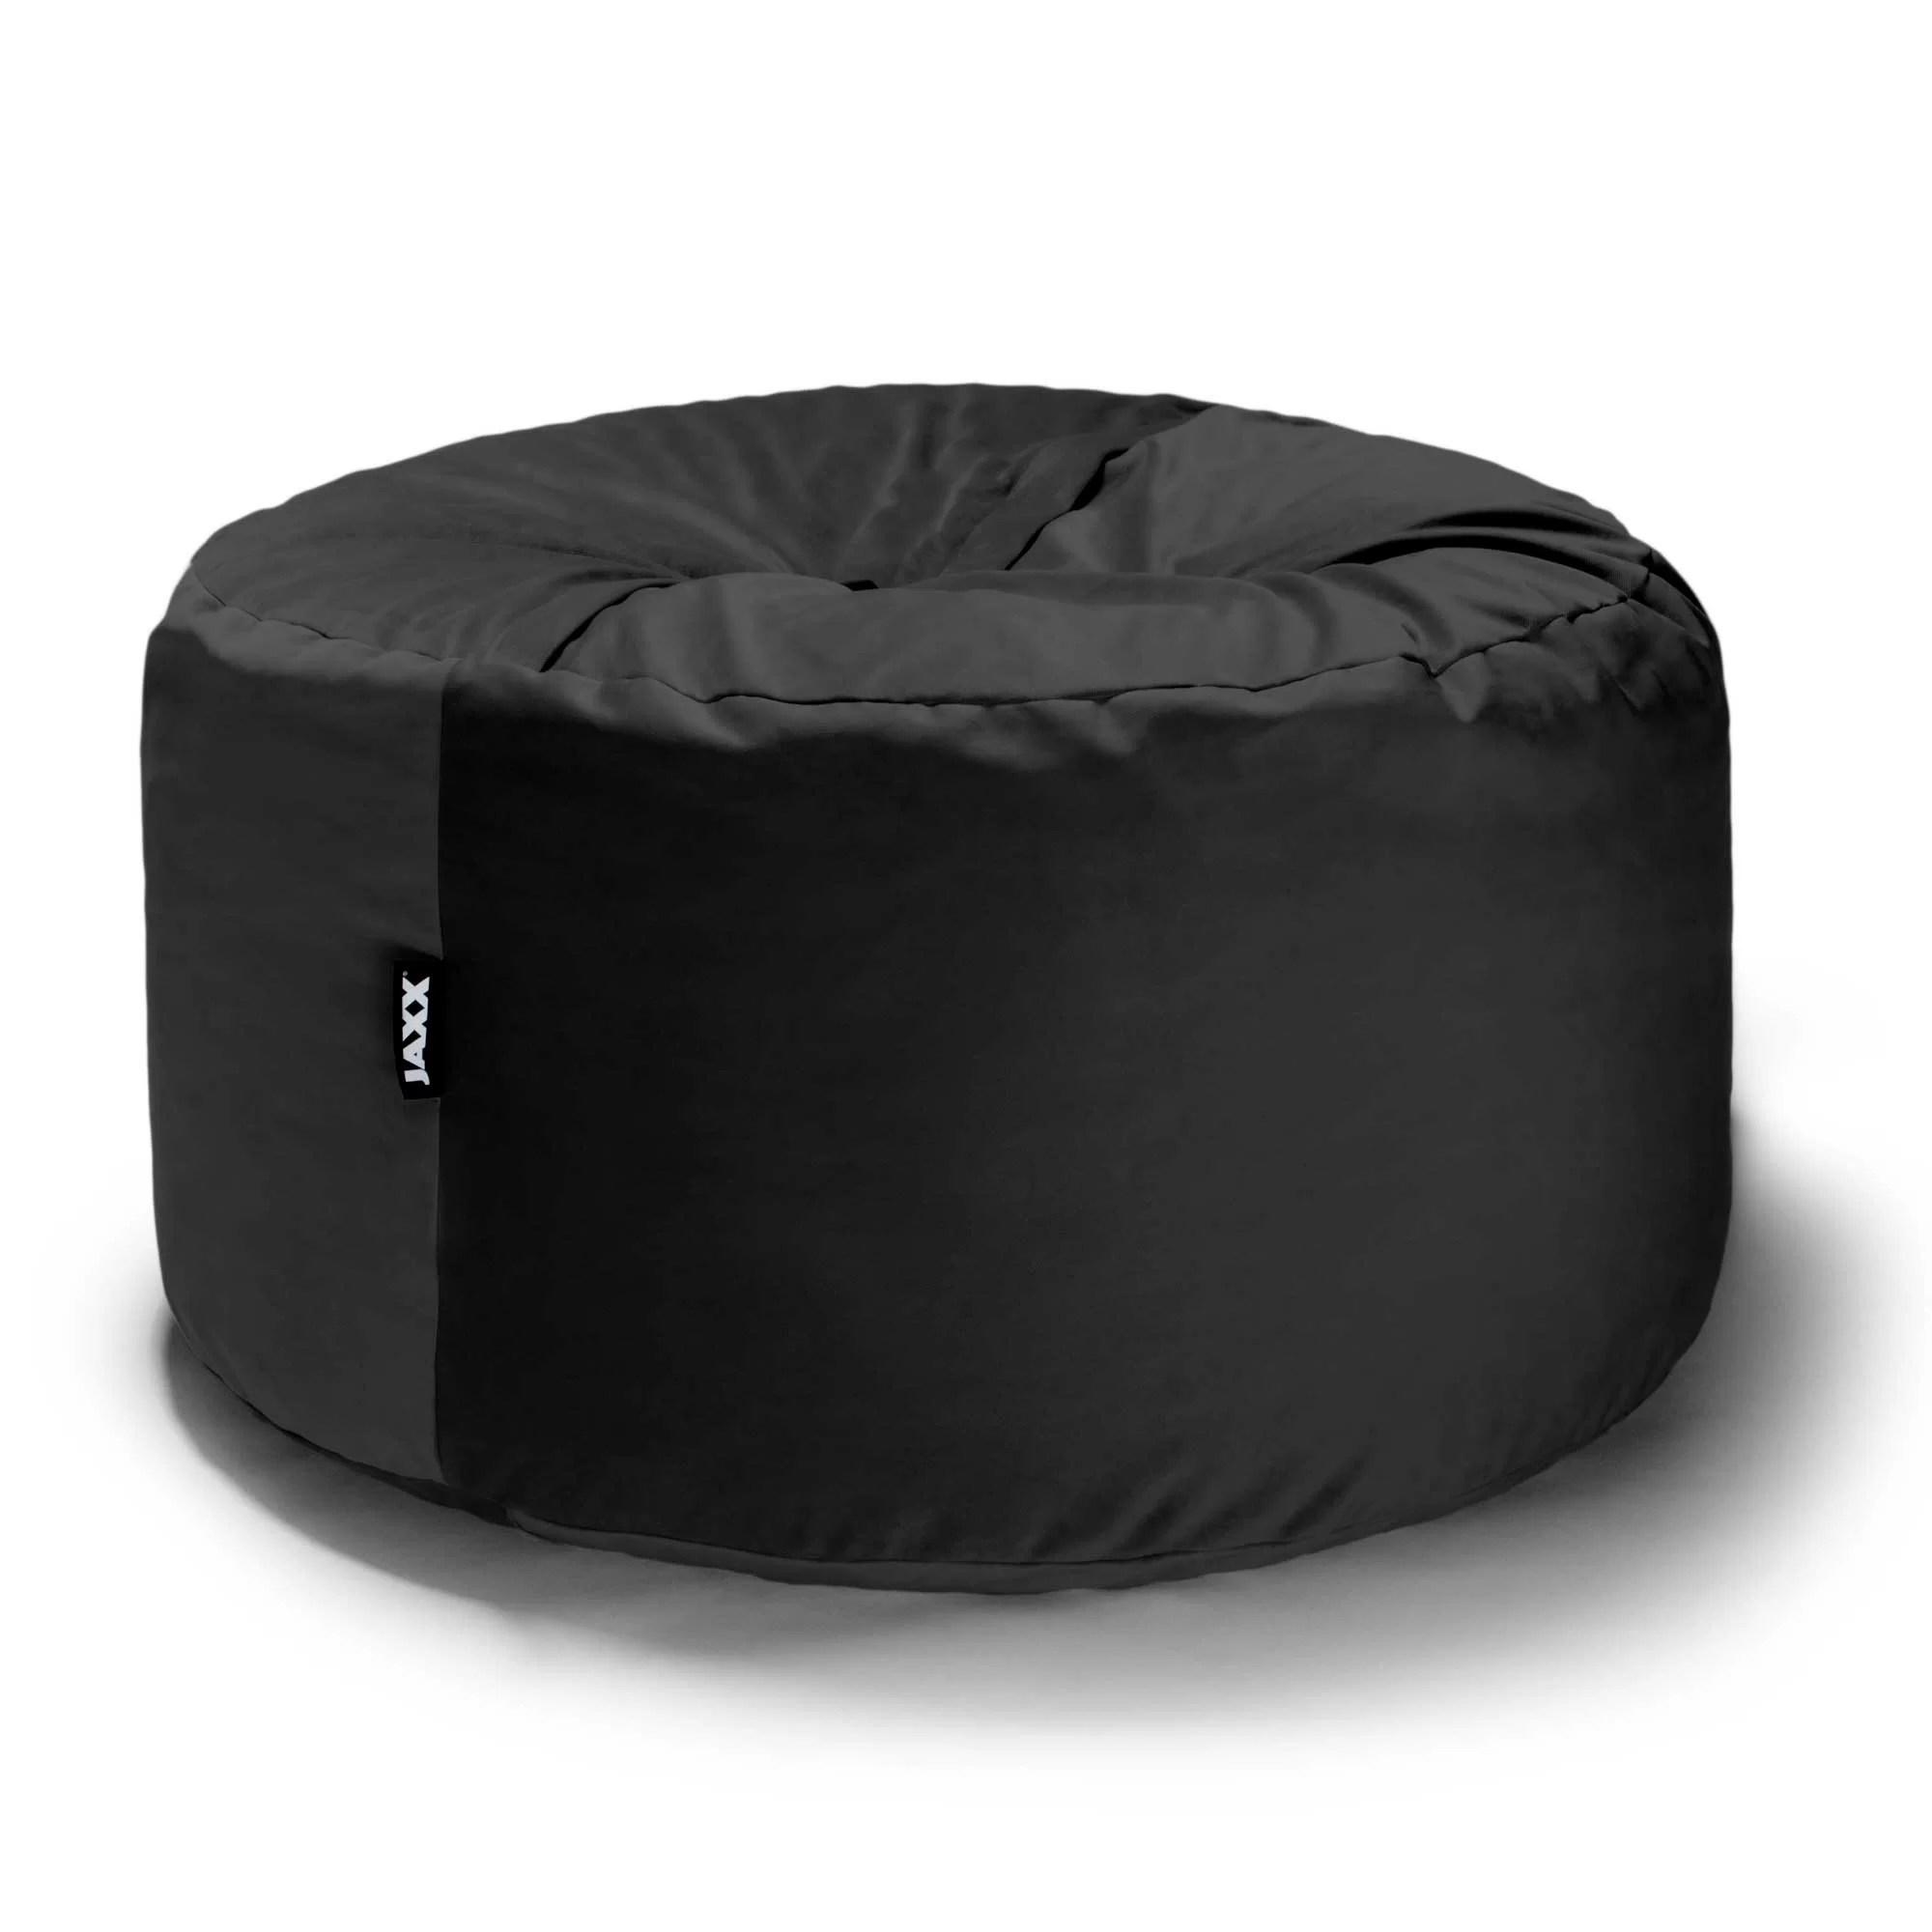 jaxx bean bag chair tripod camping lounger and reviews wayfair